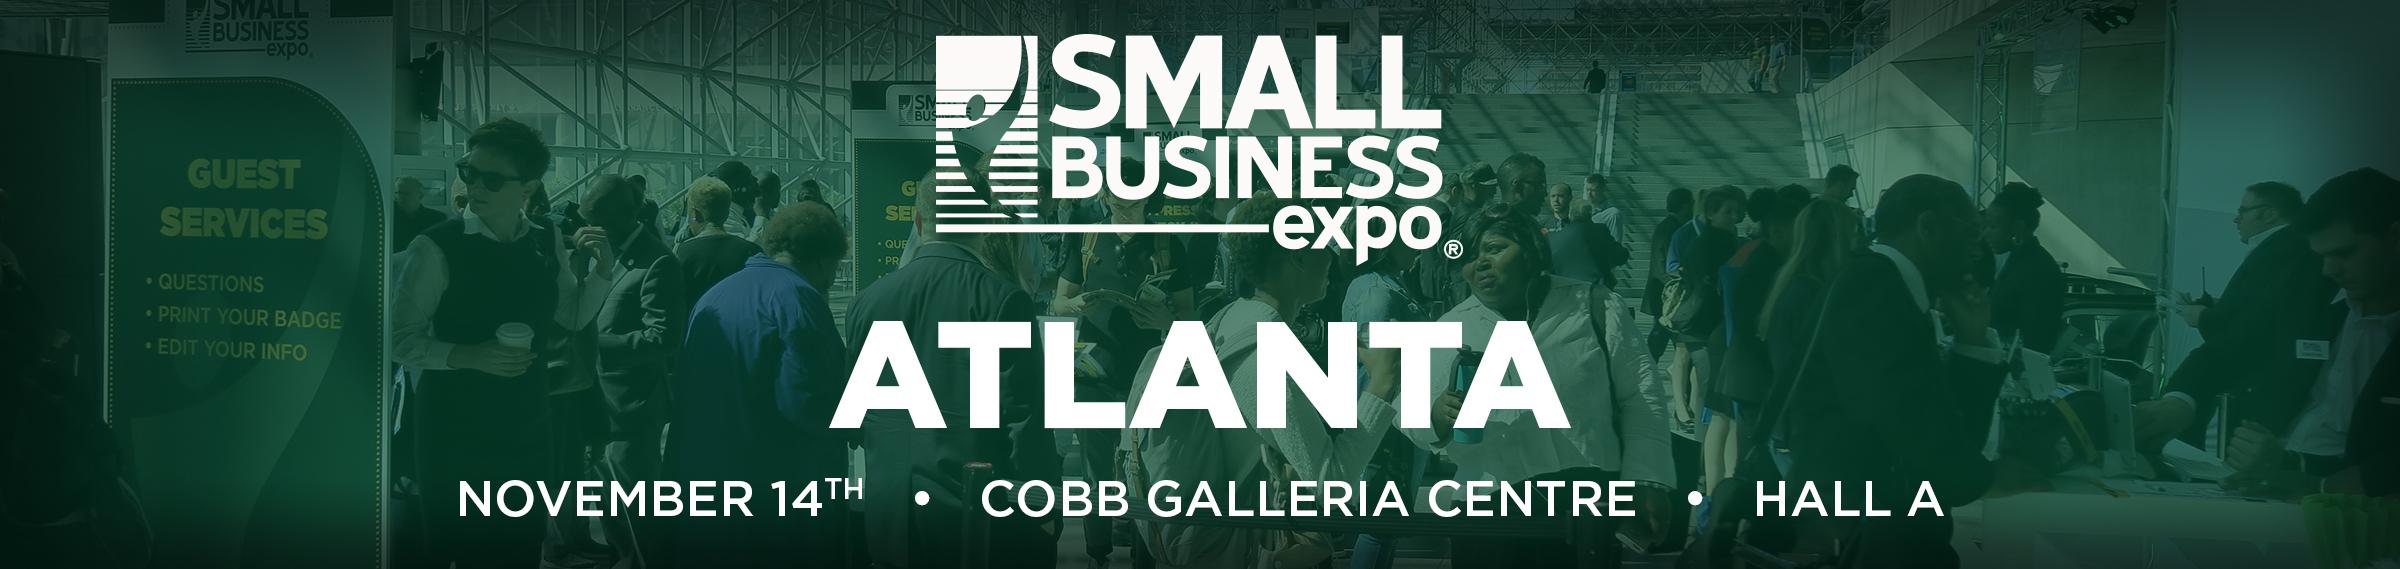 GCBCC to Exhibit During Atlanta Small Business Expo